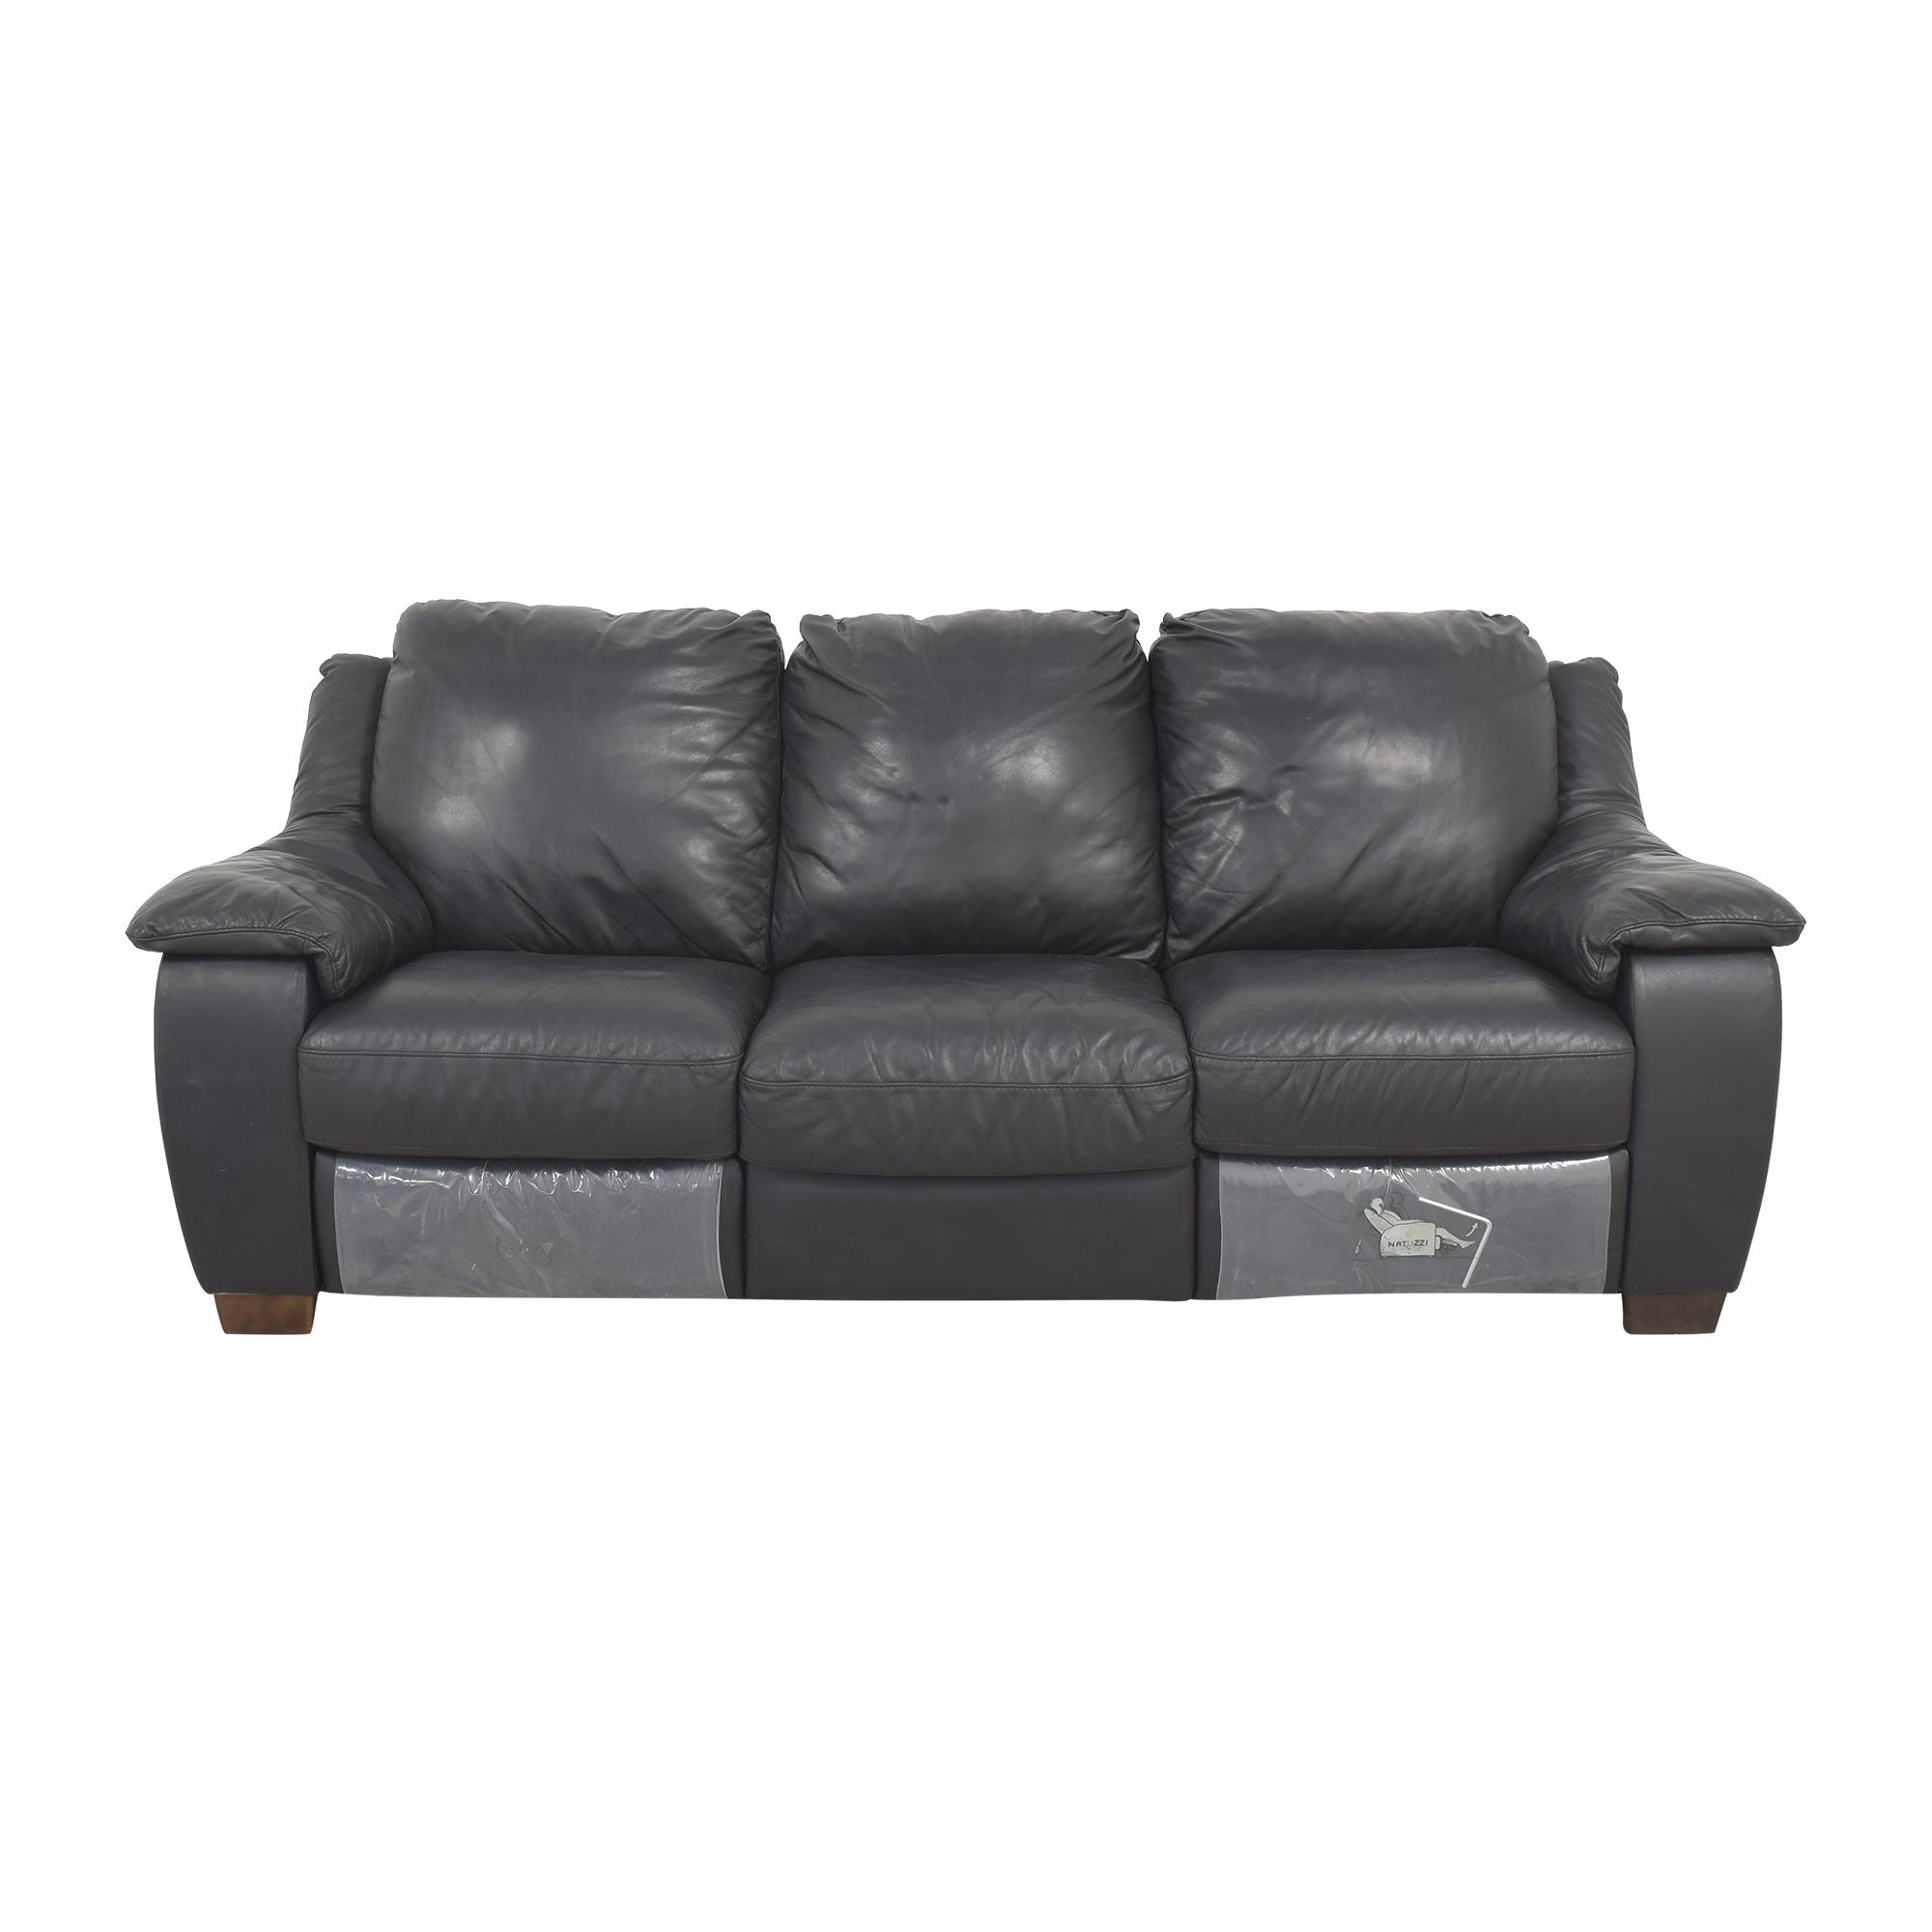 Natuzzi Double Recliner Sofa / Classic Sofas